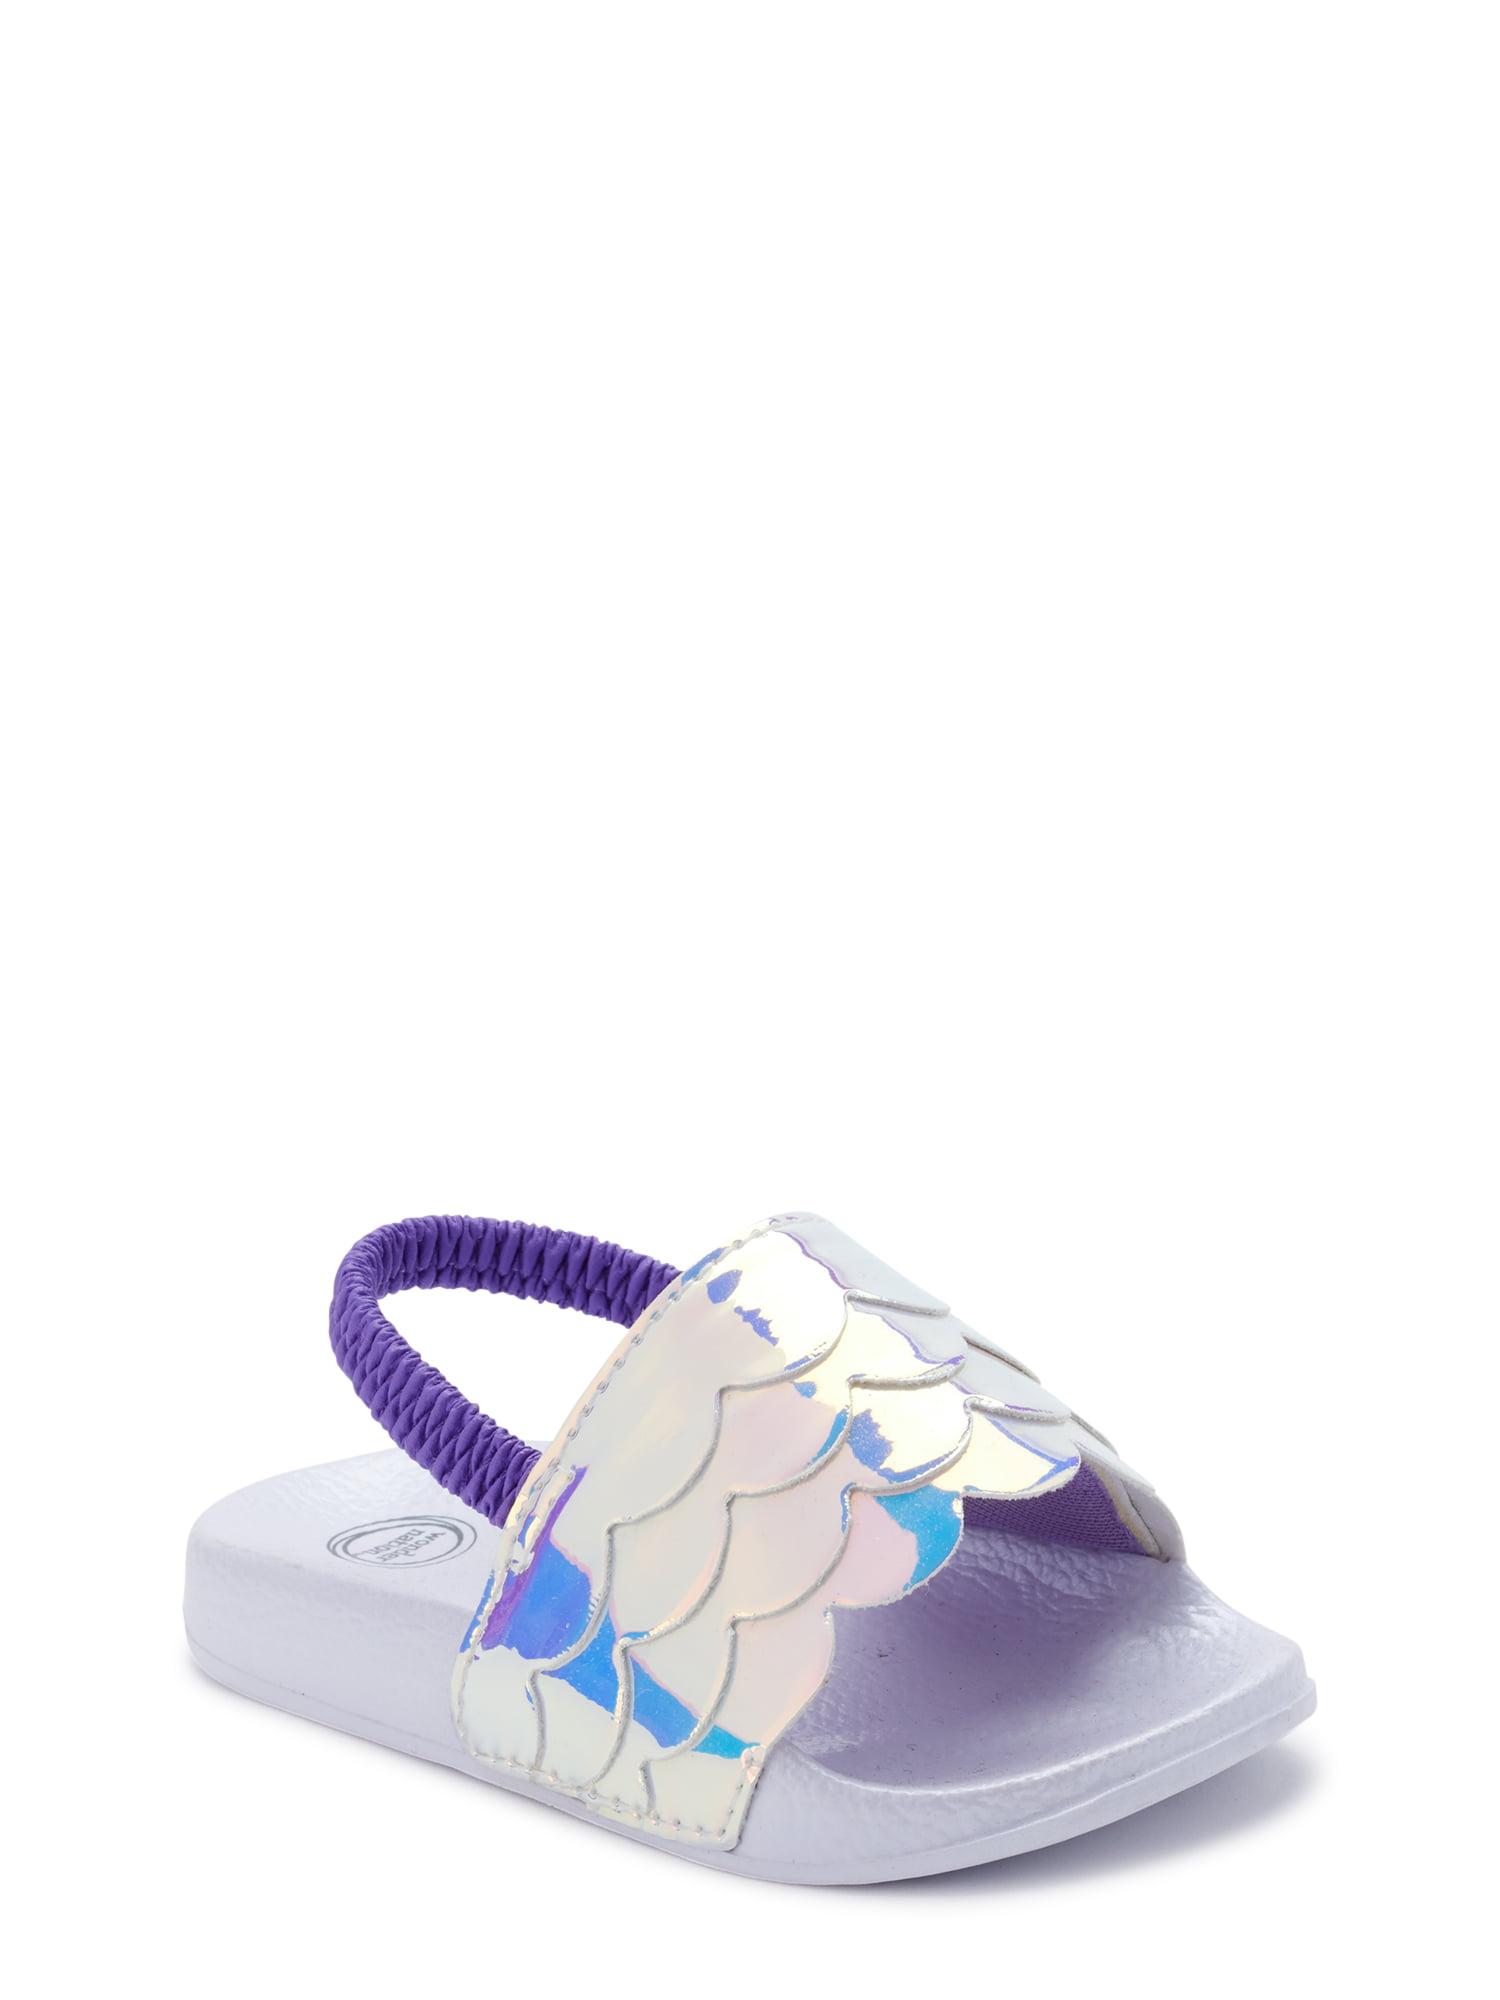 Other Baby Girl Sandals - Walmart.com